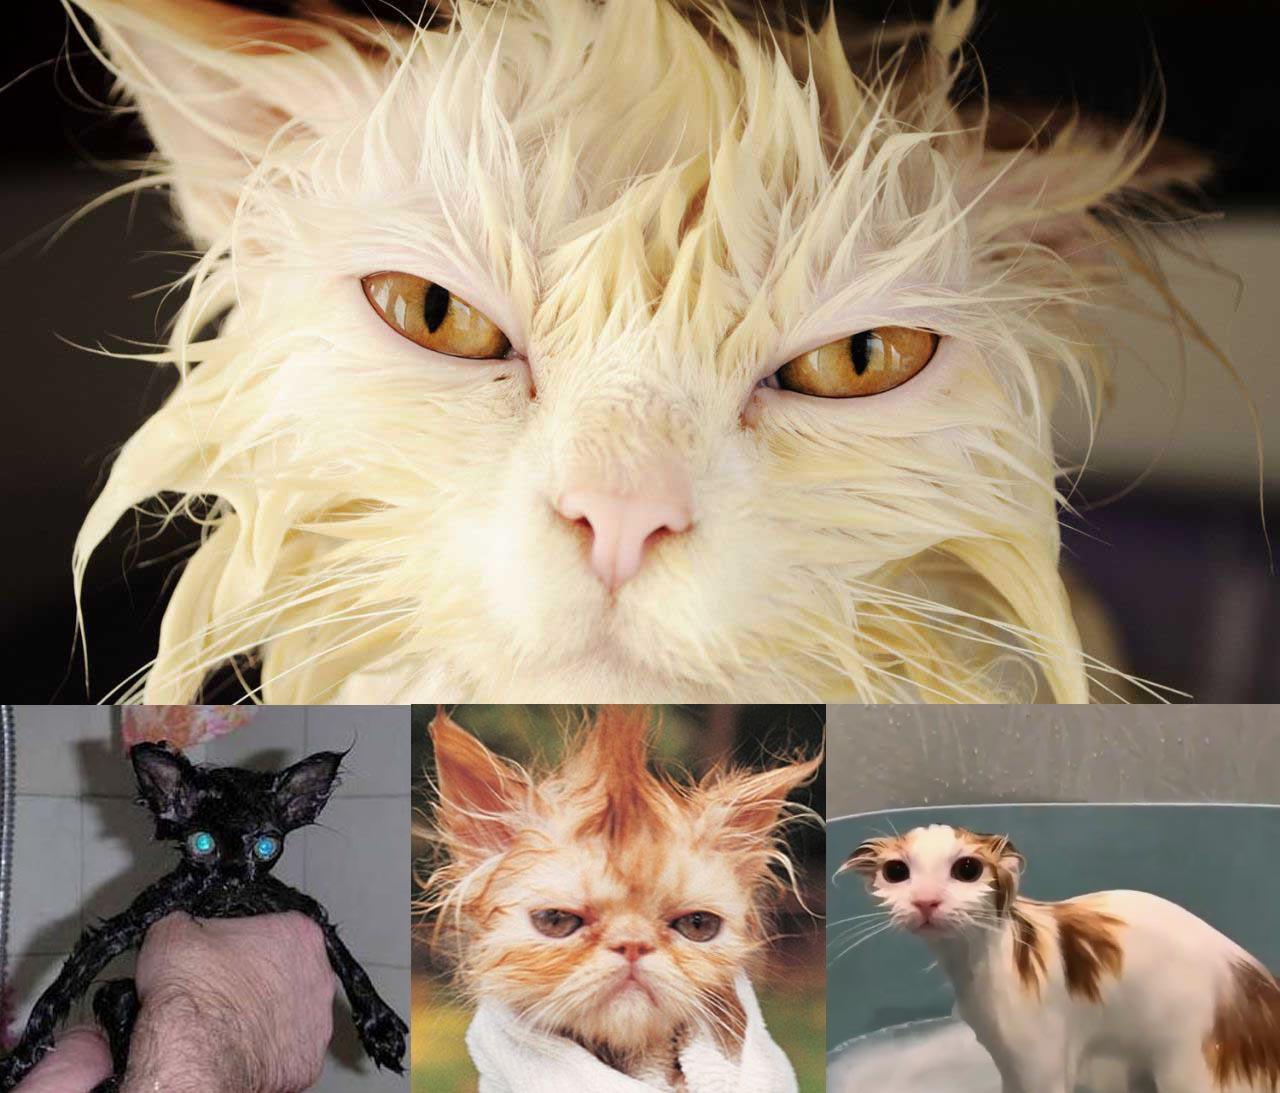 15 fotos de gatos mojados